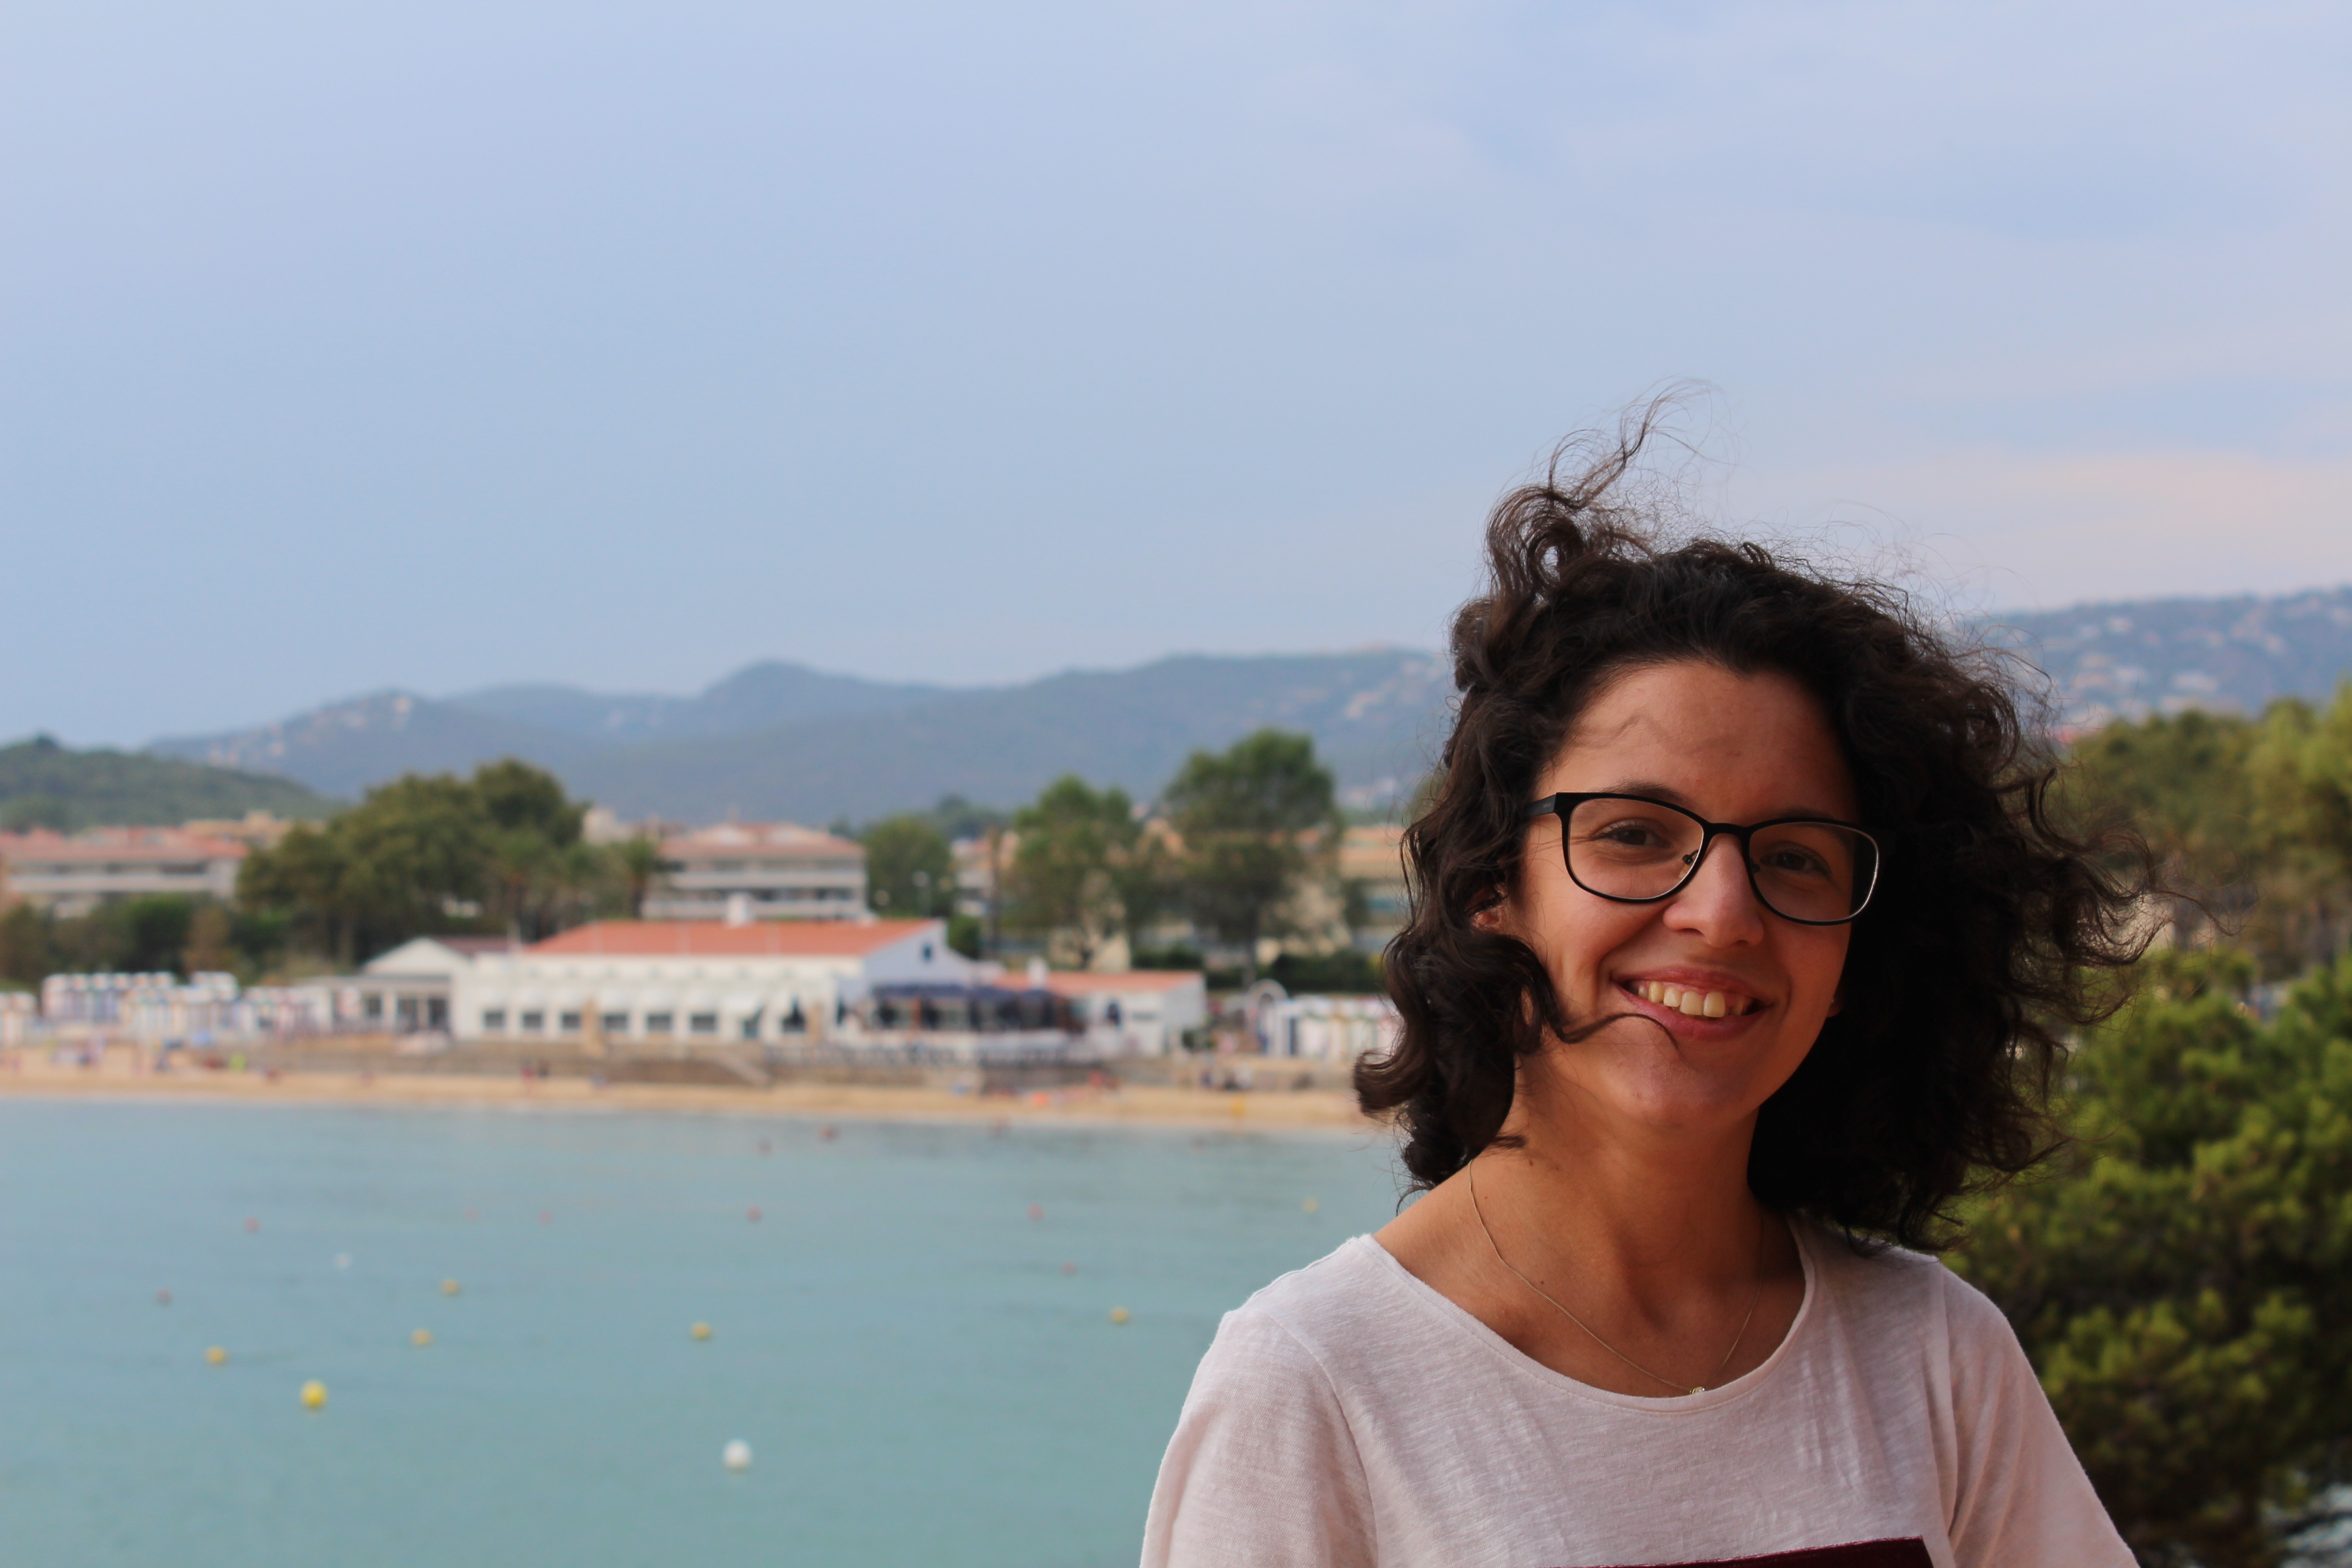 Blanca Ballesteros Cassany